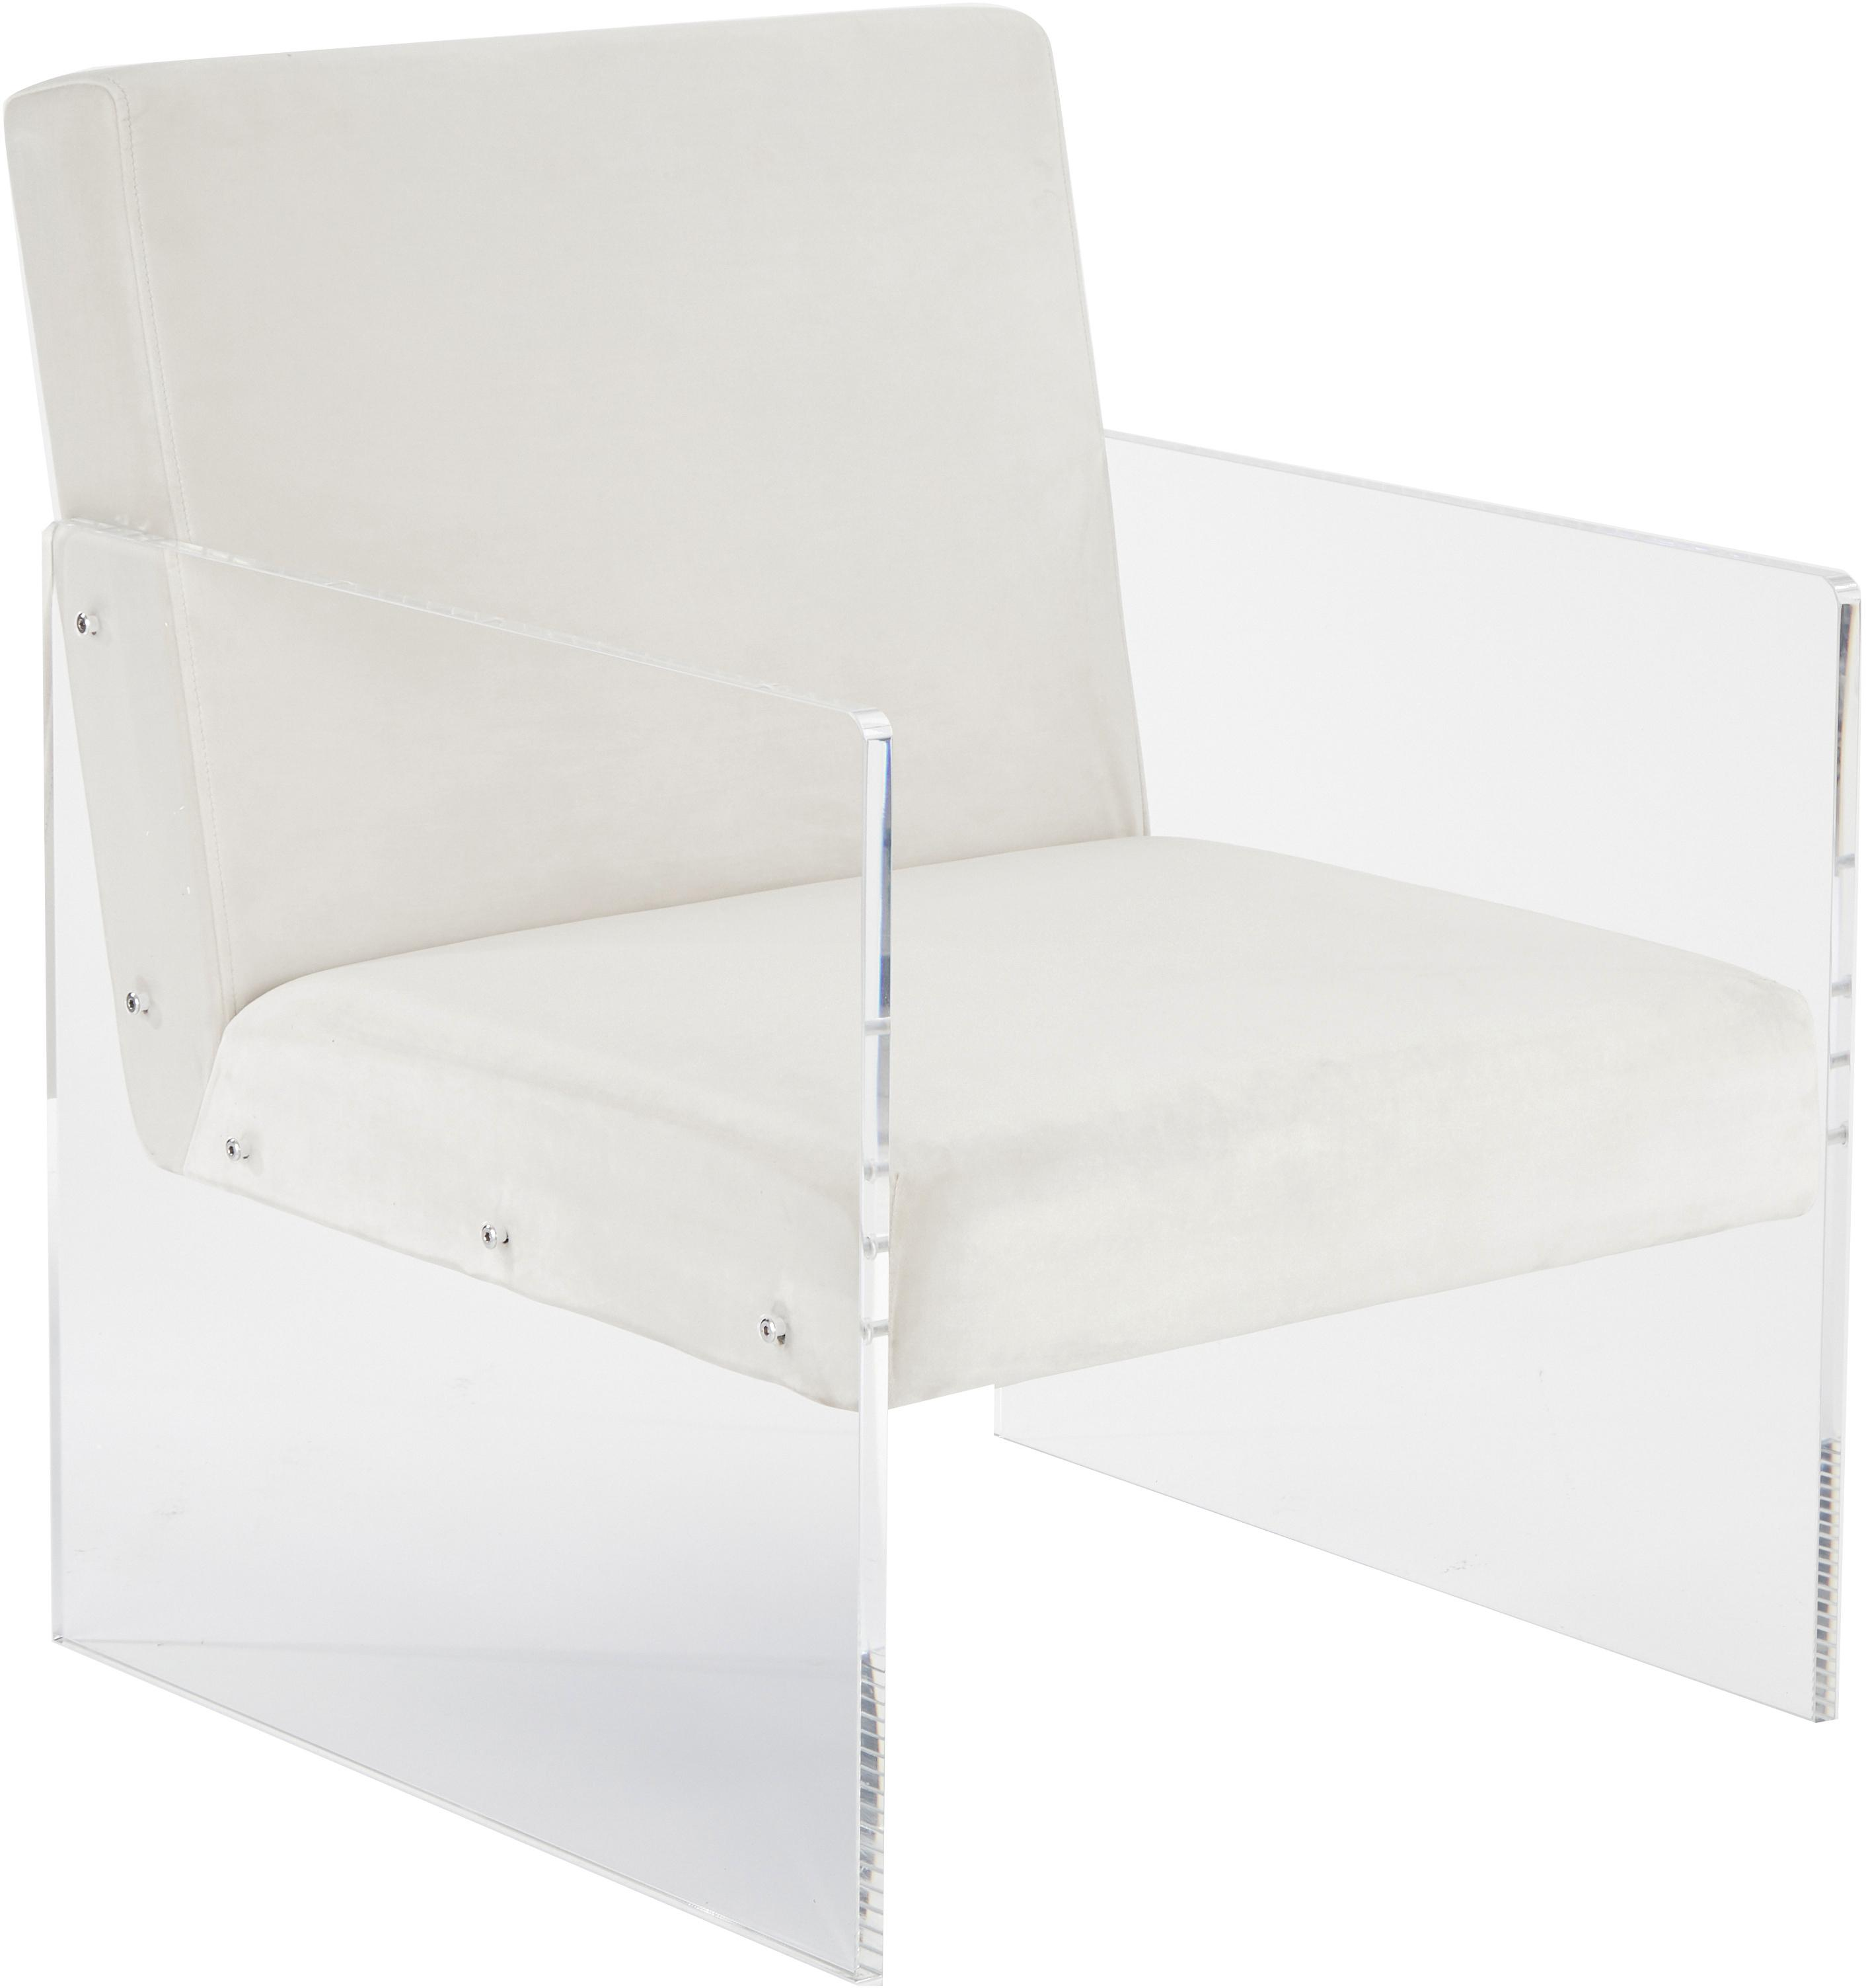 Fluwelen lounge fauteuil Ayden, Bekleding: fluweel (polyester), Frame: massief populierenhout, m, Poten: acrylglas, Fluweel beige, B 64  x D 74 cm